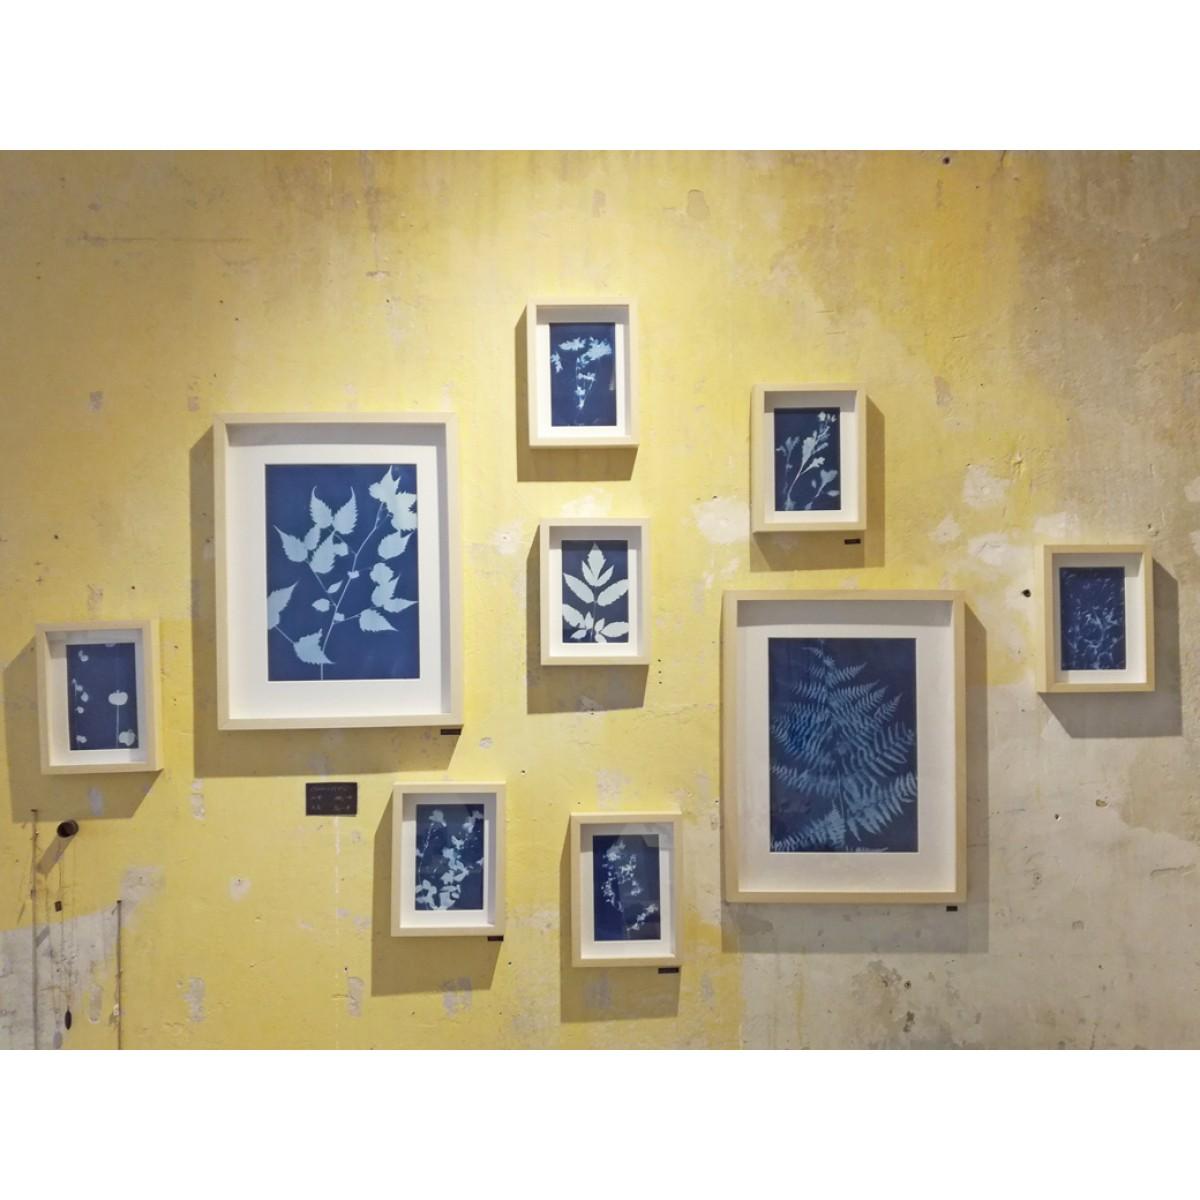 Anka Büchler, Luzerne, Blaudruck,Cyanotypie, Unikat, A6, Motiv 1